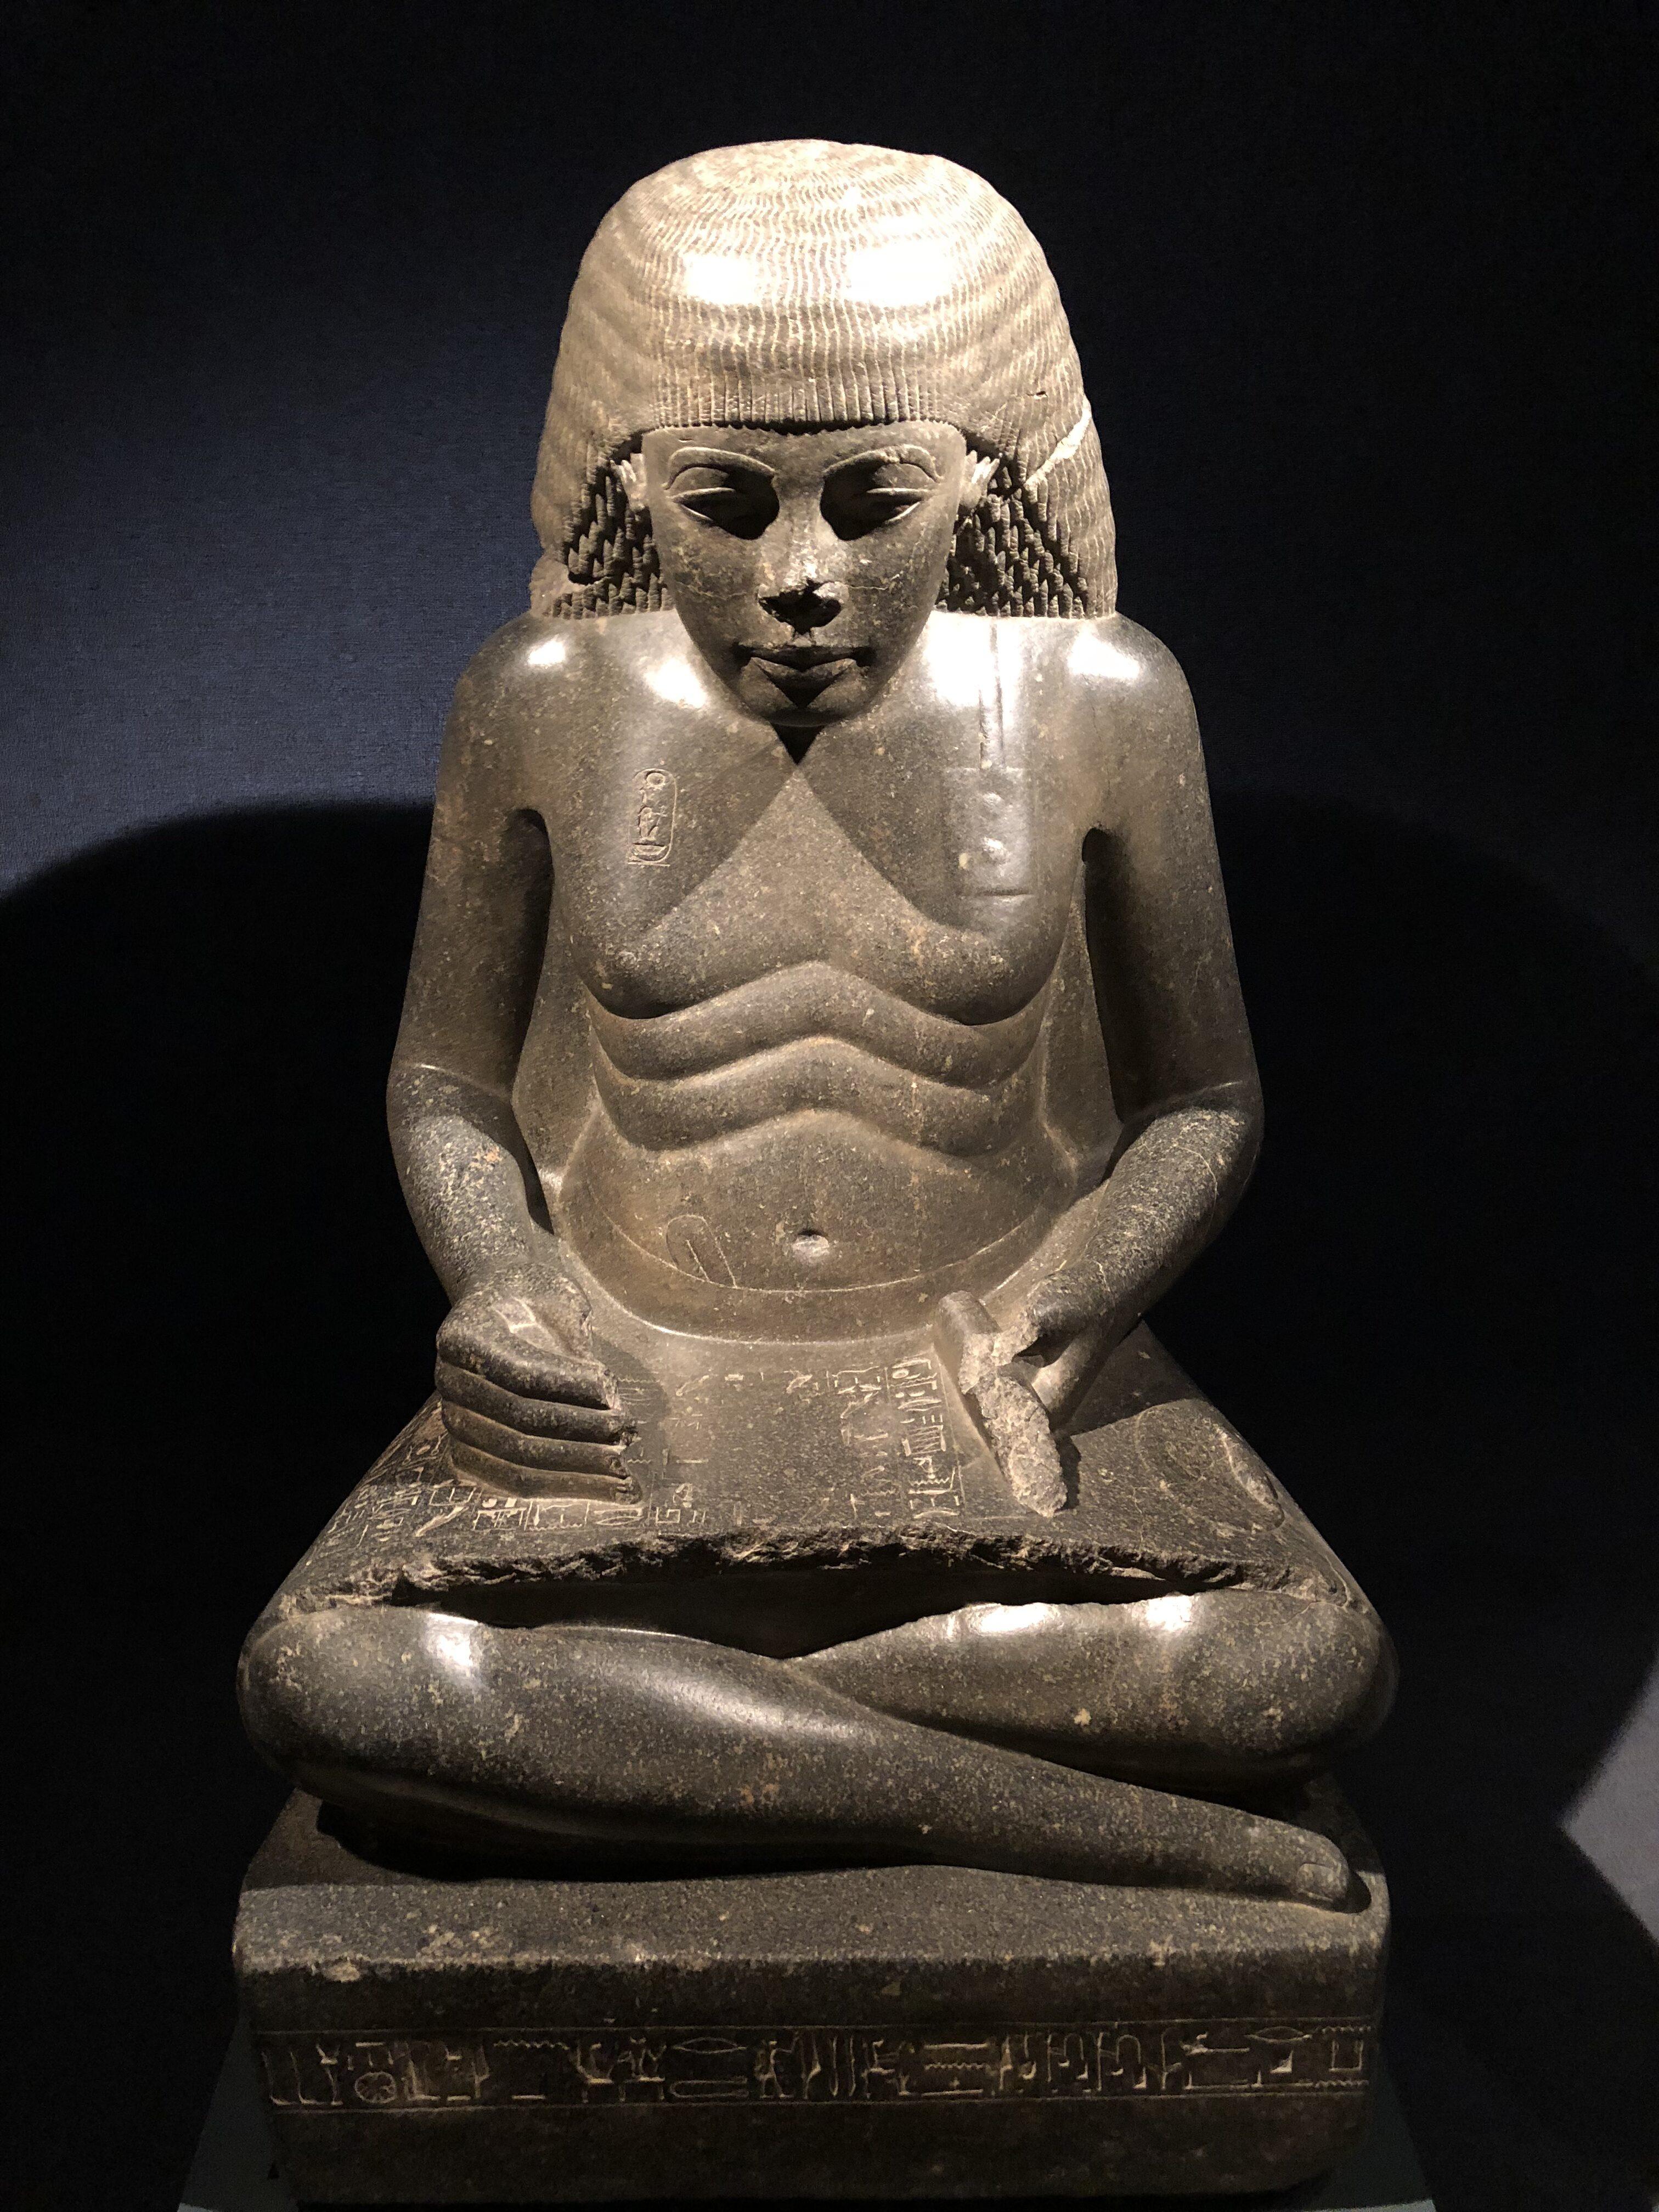 Amenhotep, Scribe Son of Hapu